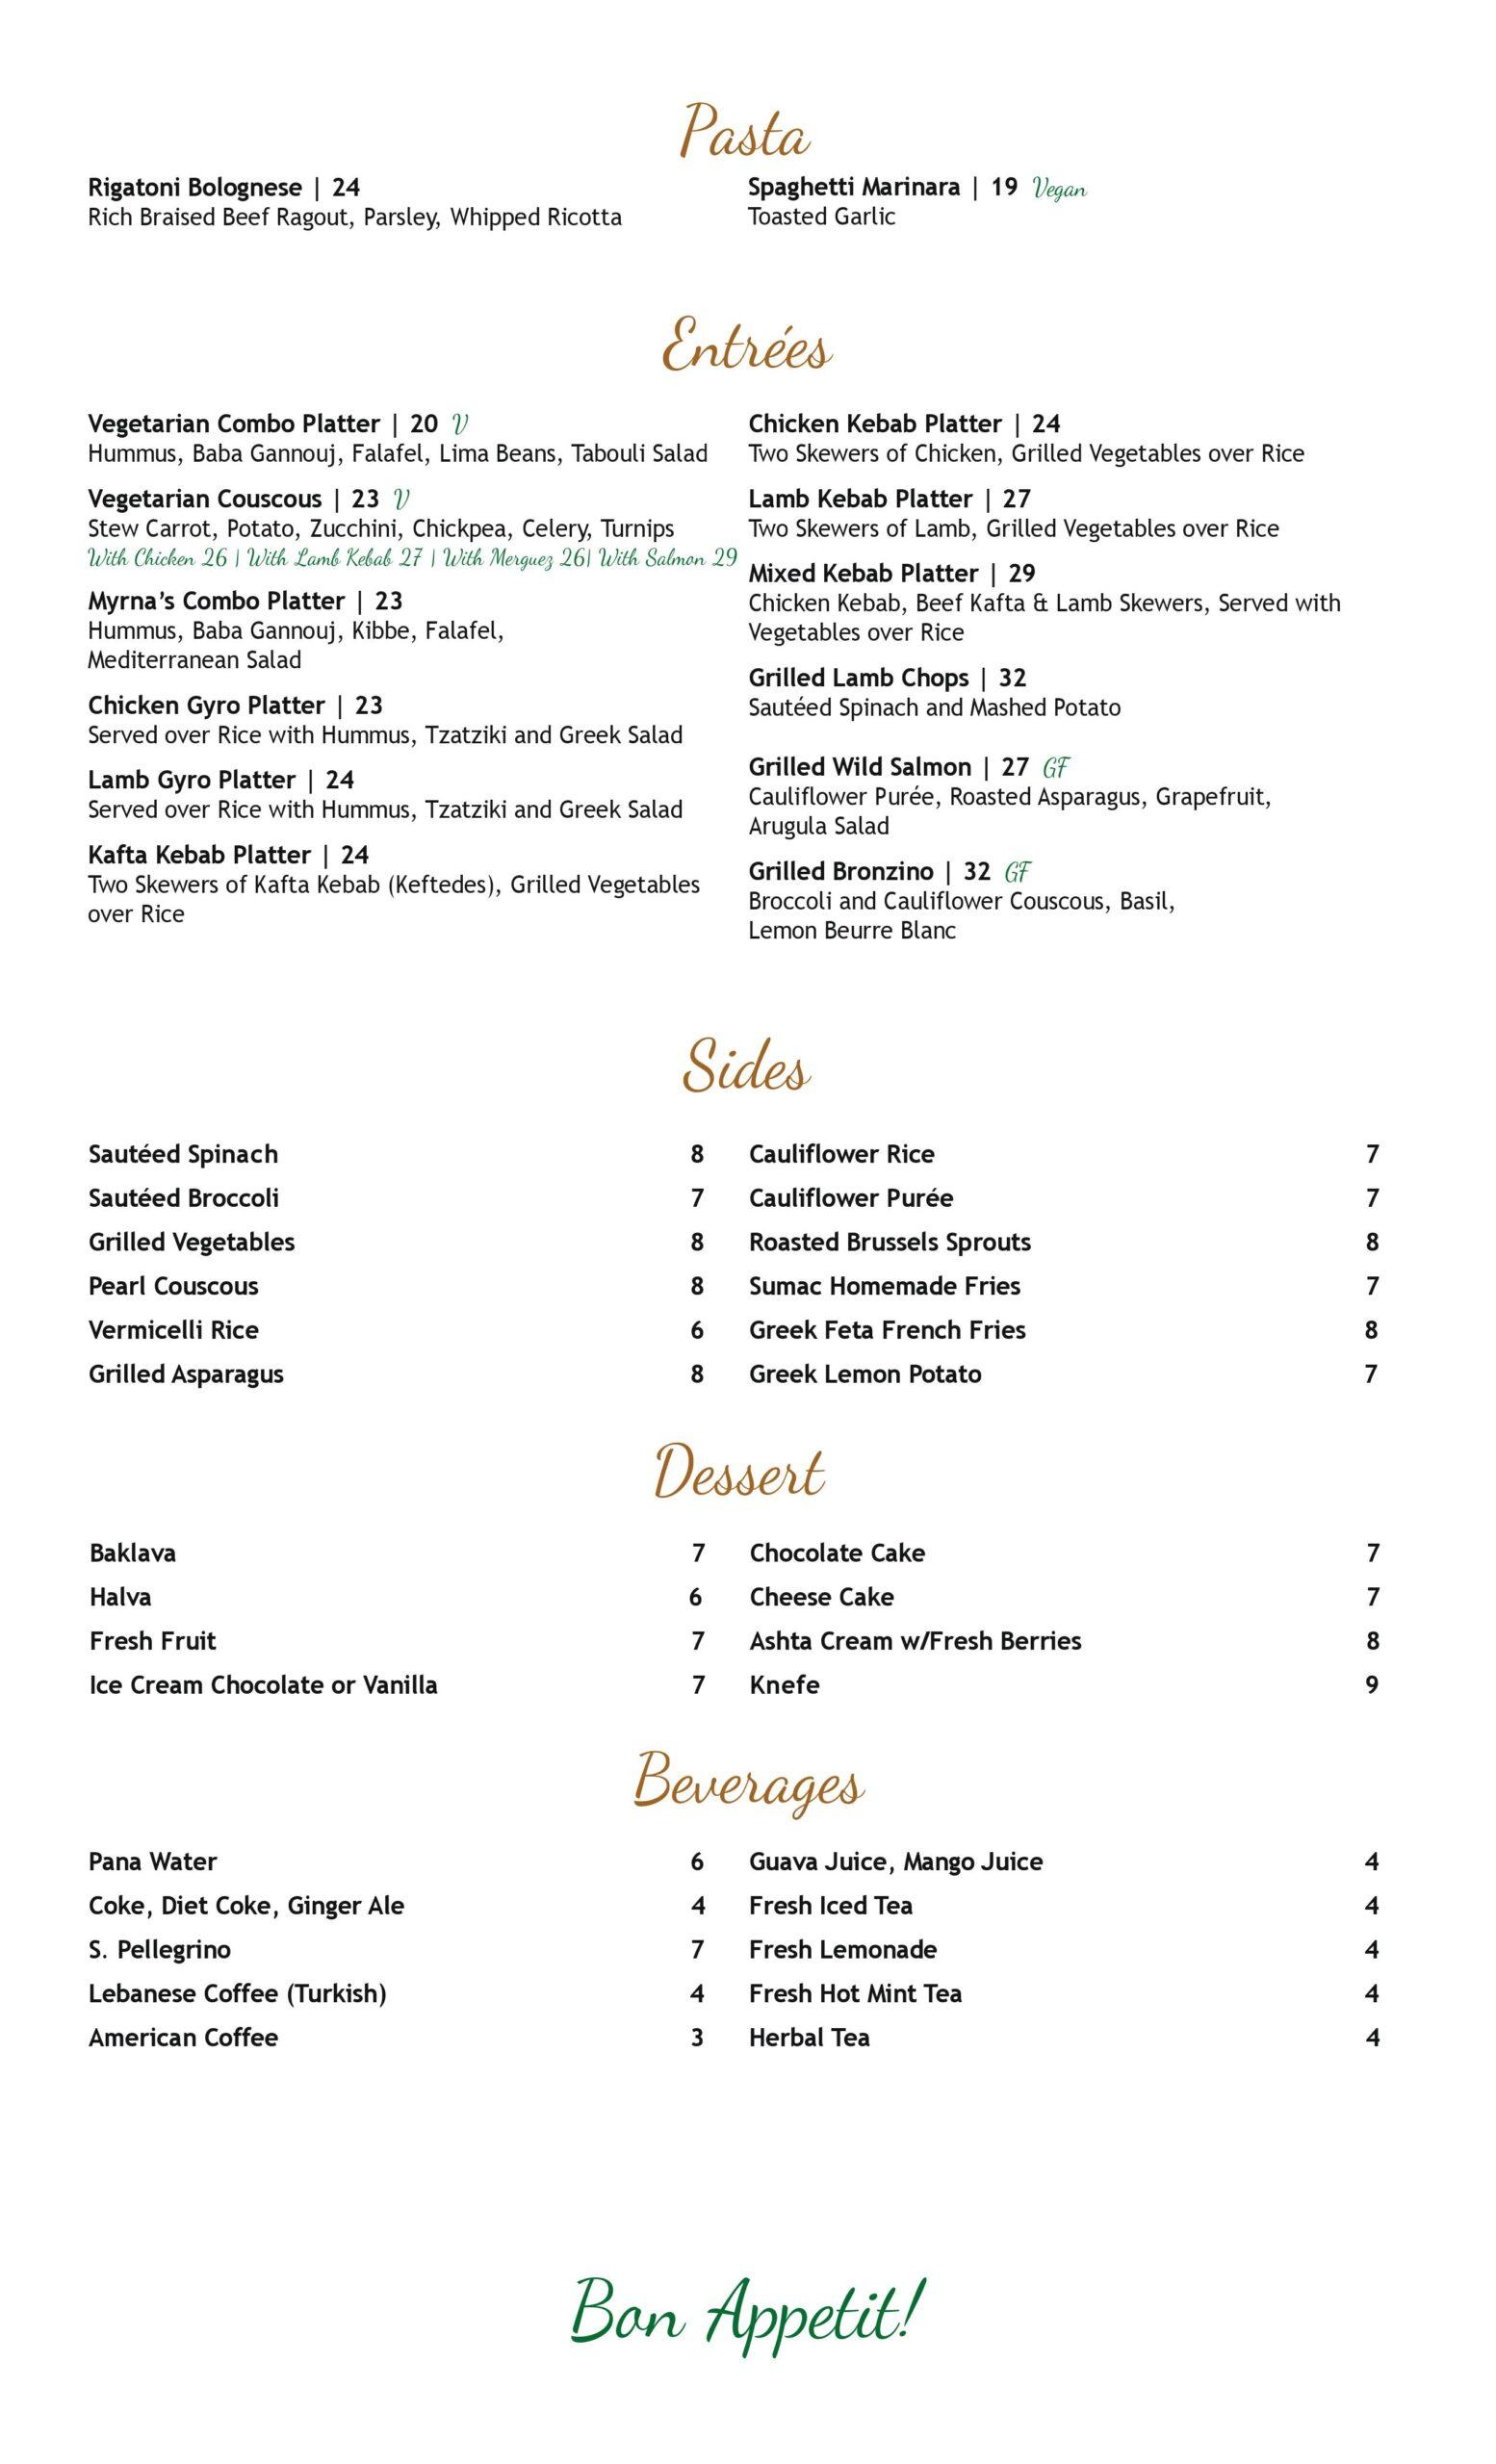 Dine in Menu of Greenwich Flavor by Myrna's